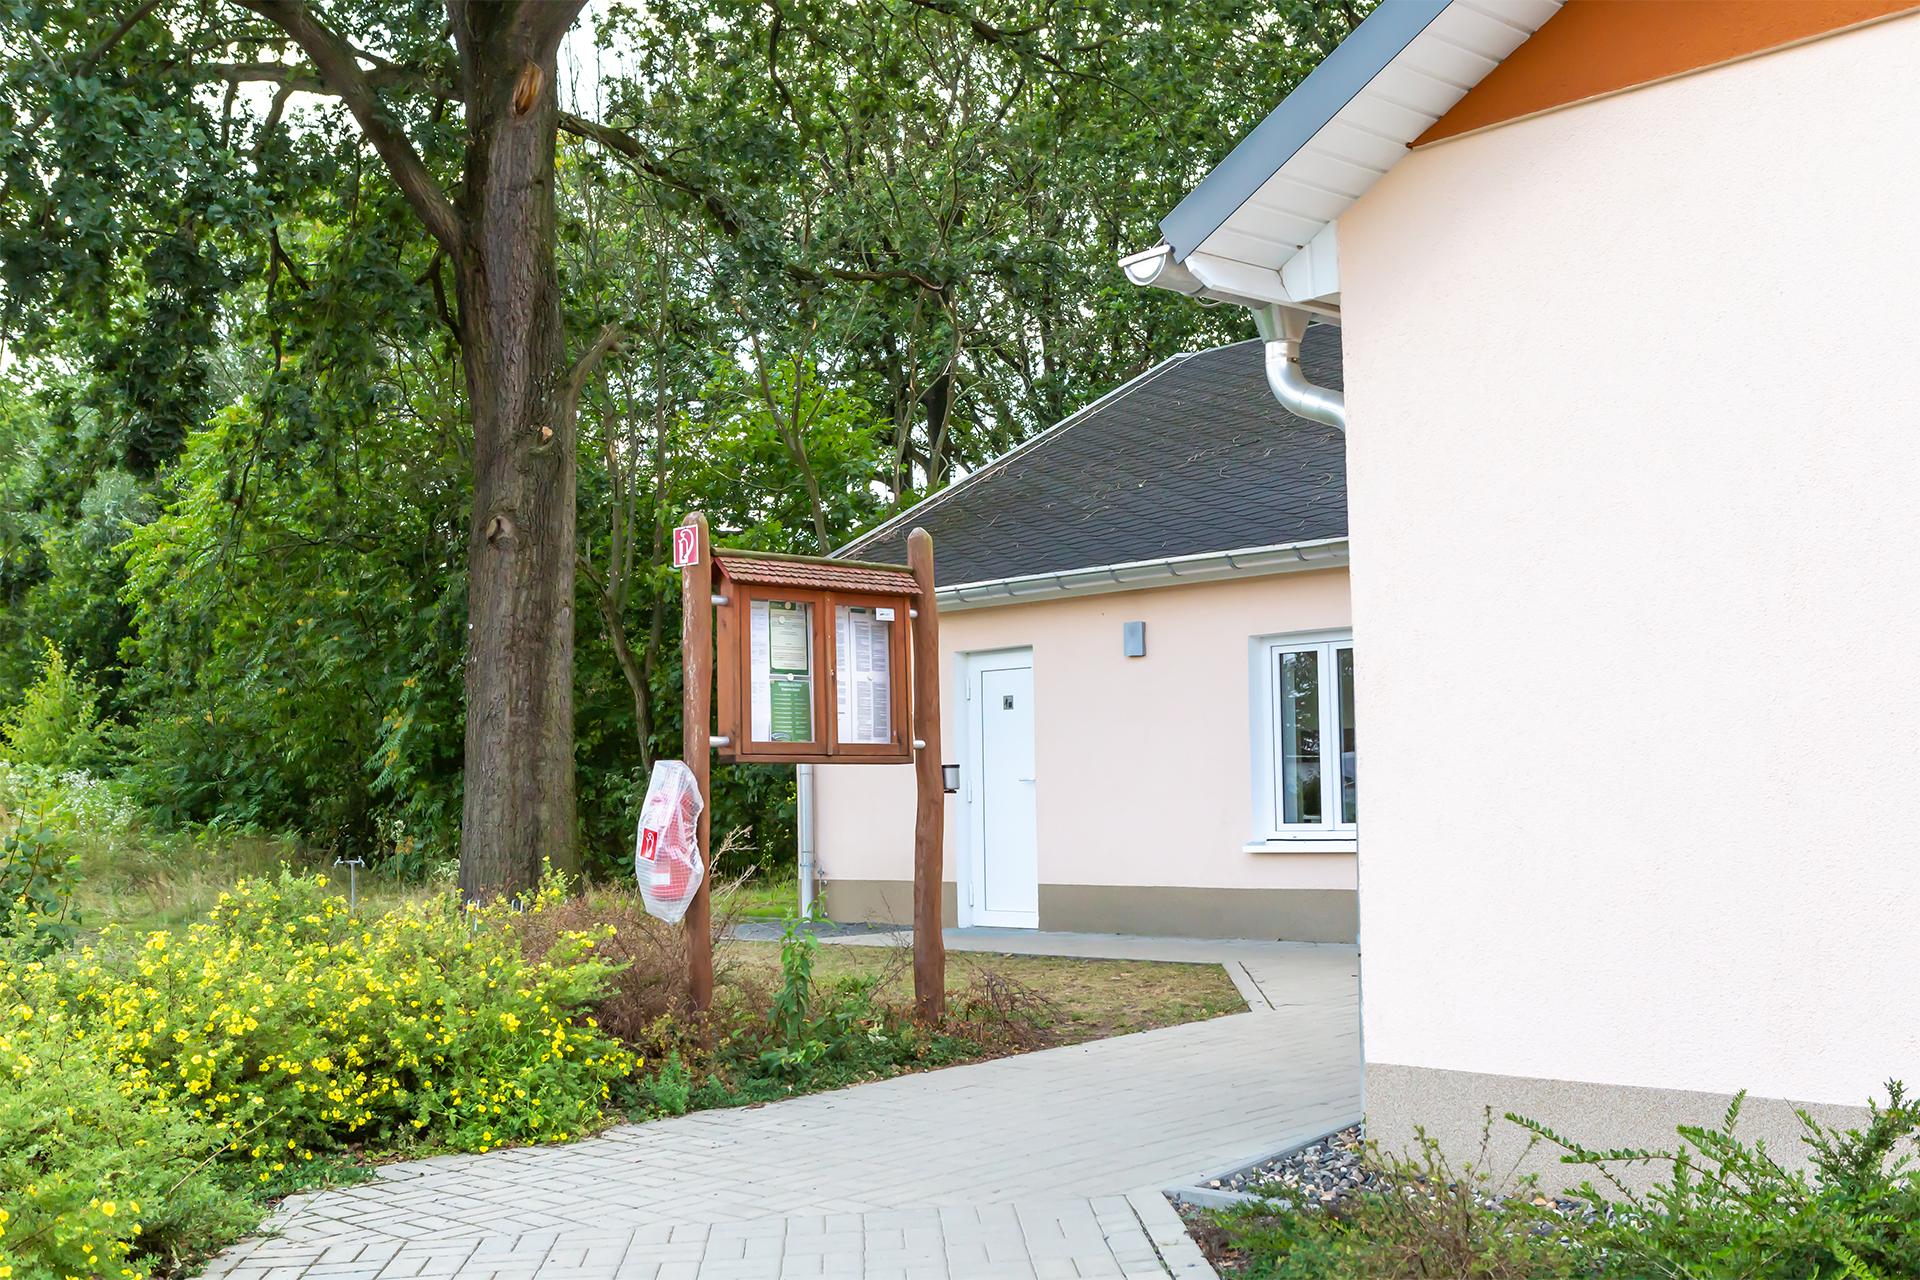 Campingplatz Pirna mit Sanitärgebäude